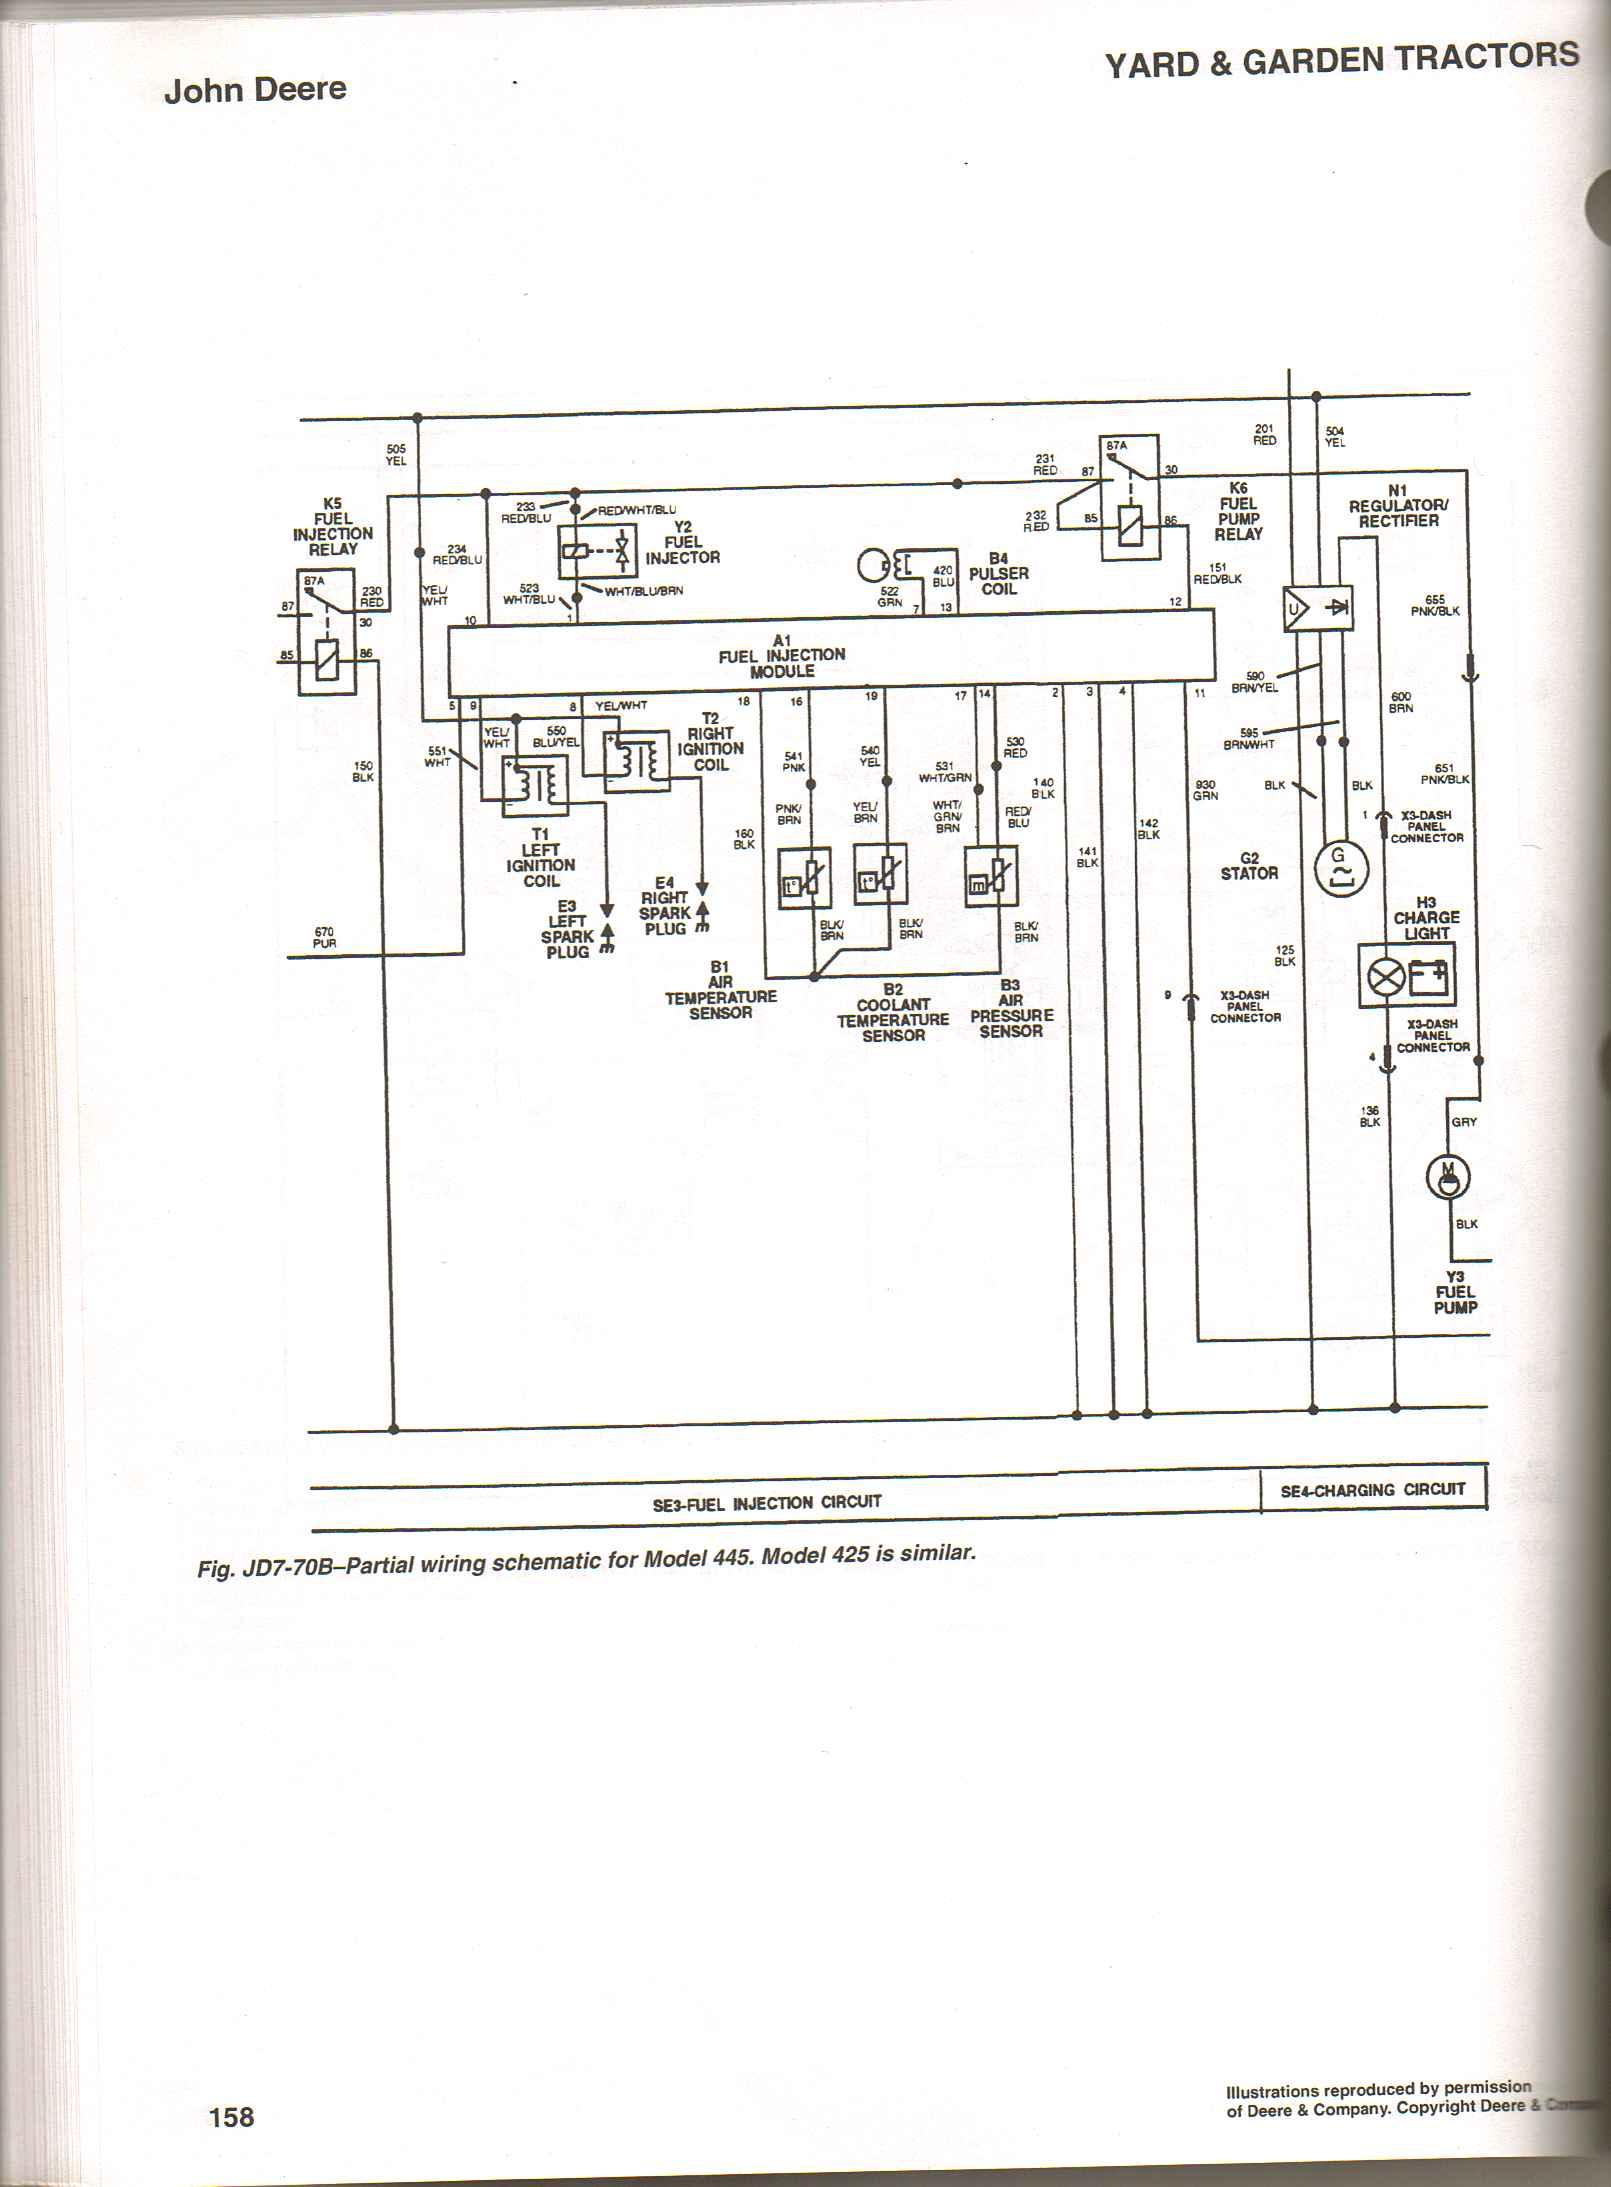 john deere 820 fuse box diagram 955 john deere fuse box wiring diagram data  955 john deere fuse box wiring